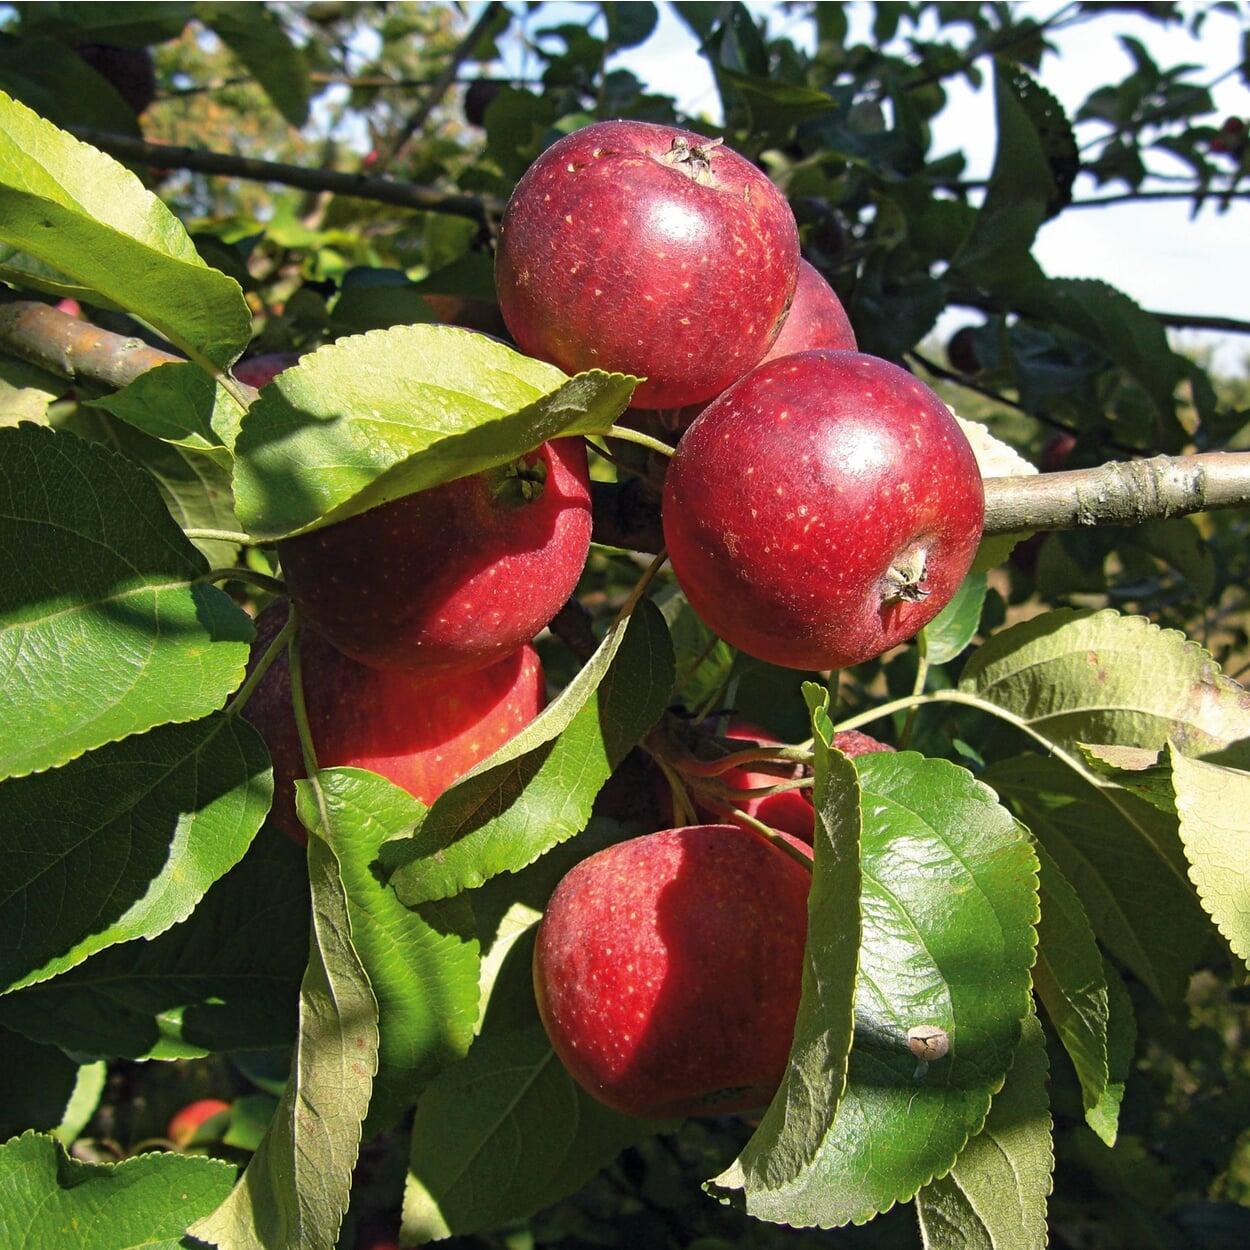 Stachelbeeren (Ribes uva-crispa)